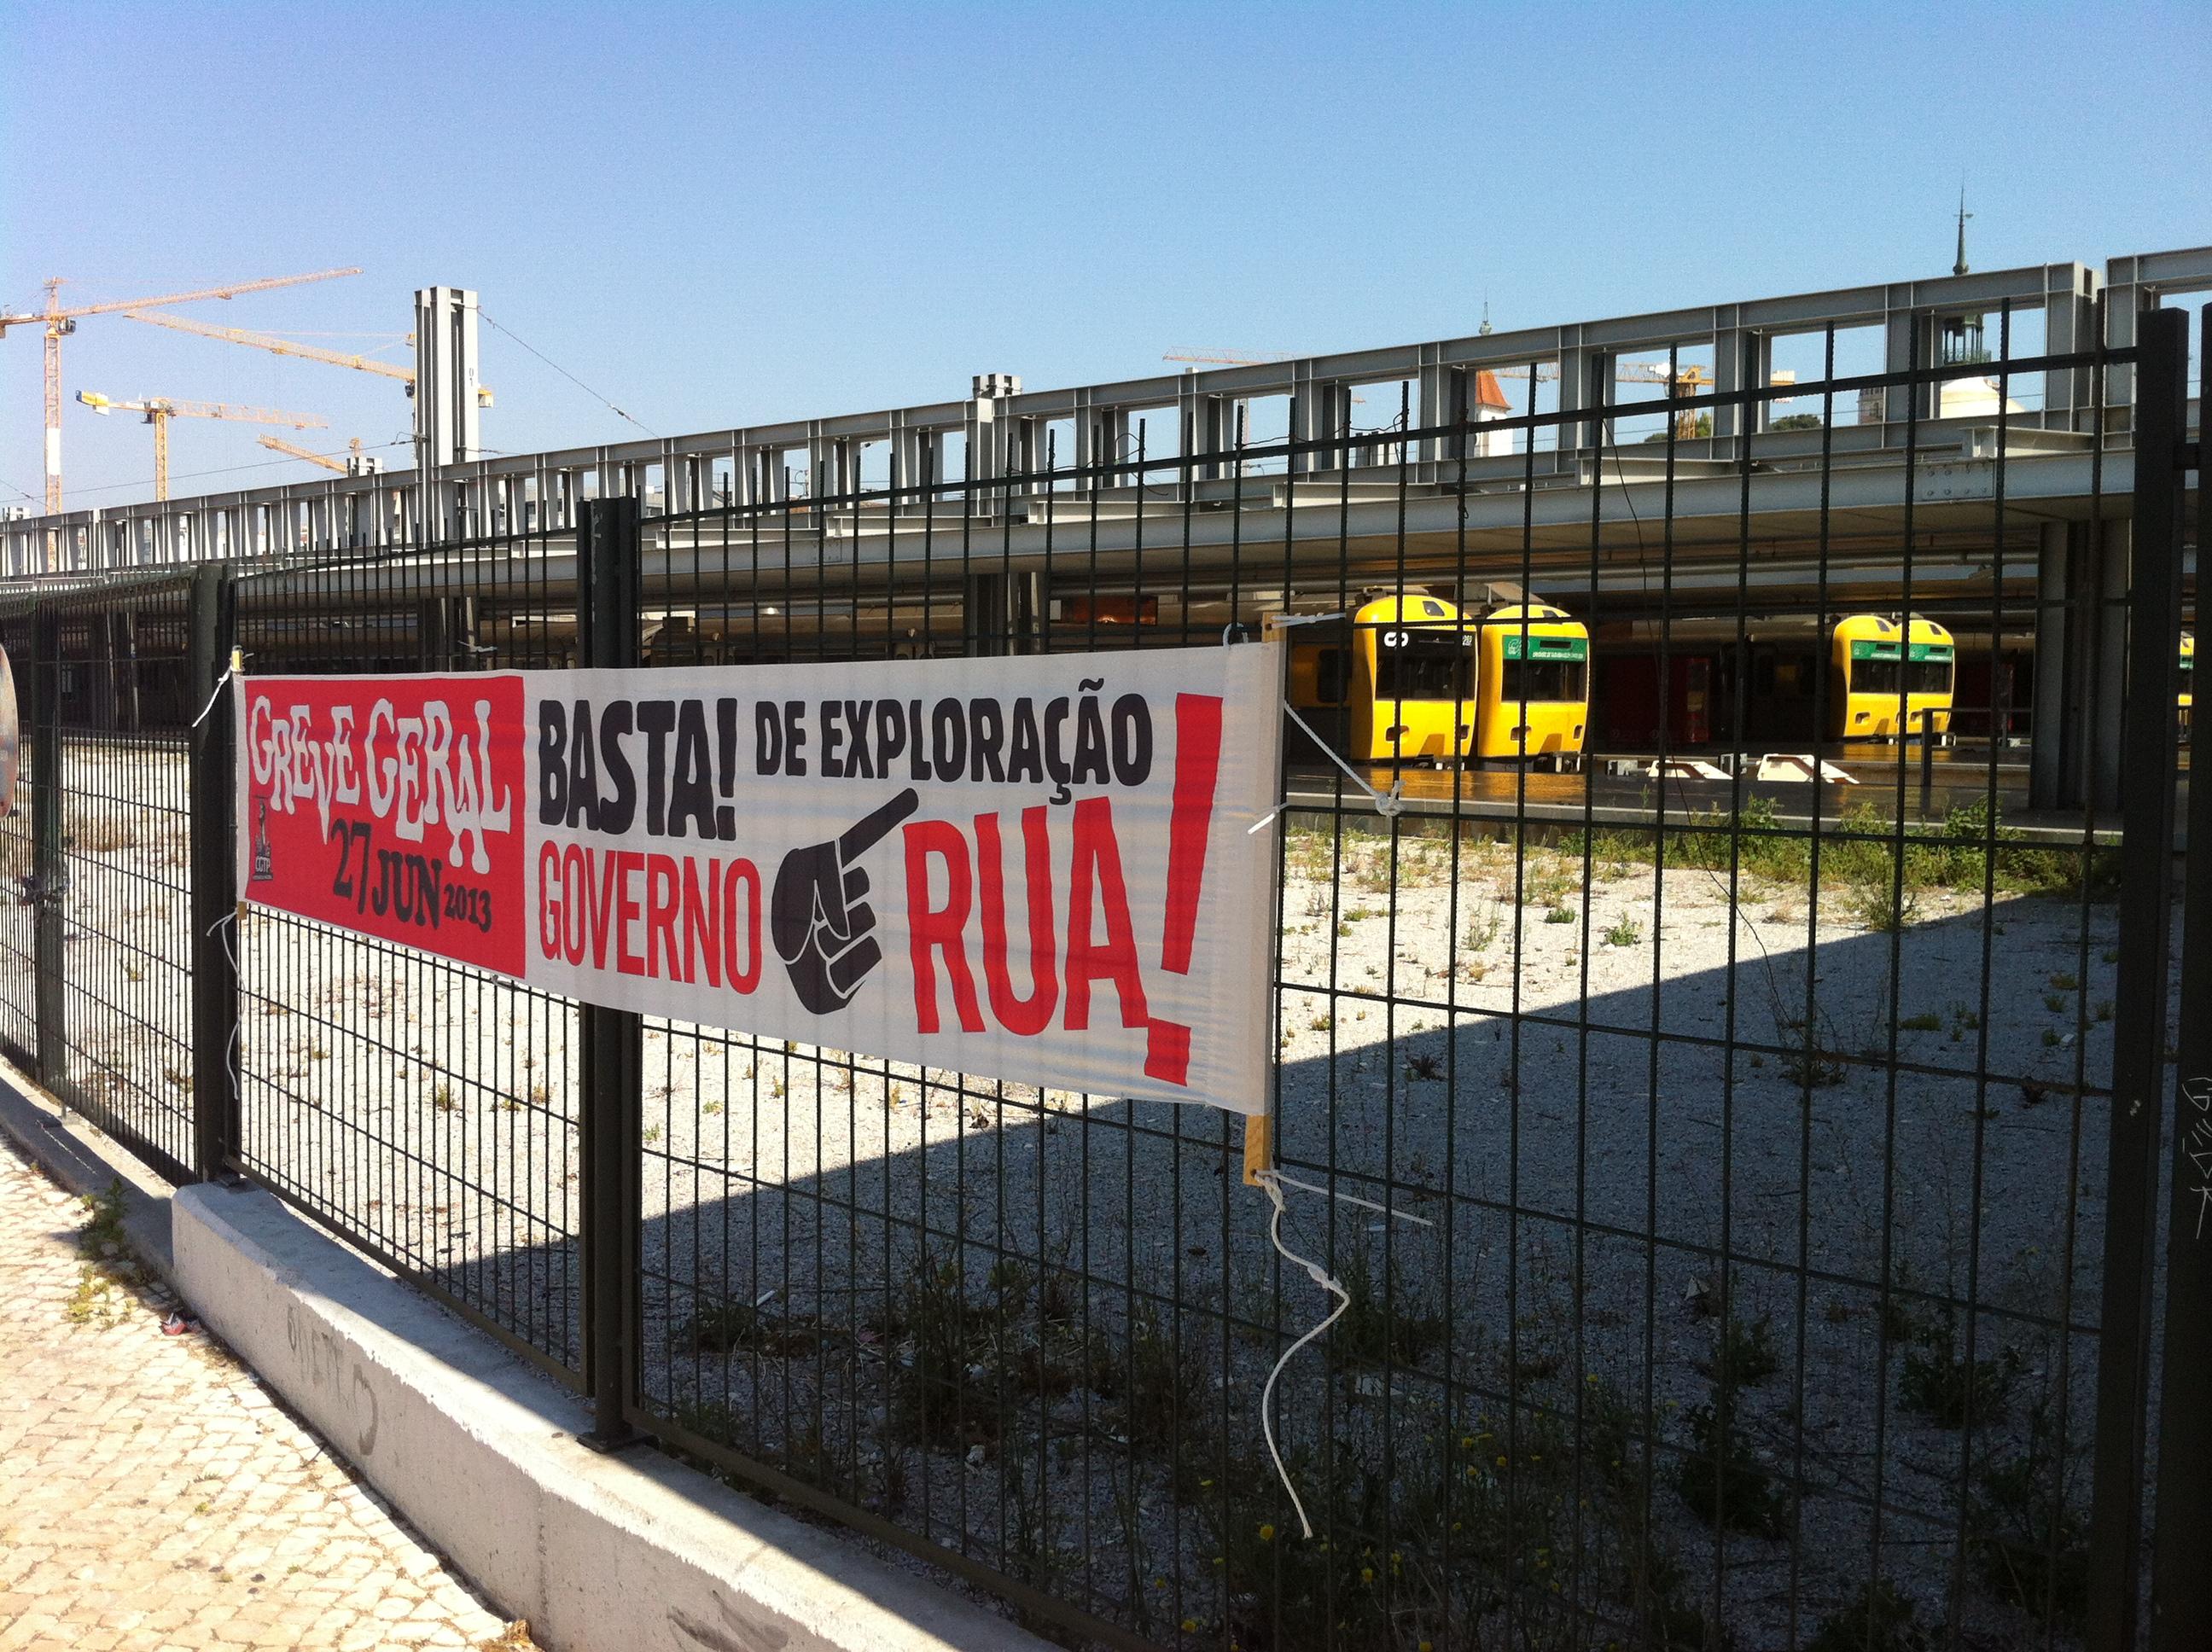 greve 27 de junho: metro fechado, comboios parados e autocarros a meio gas